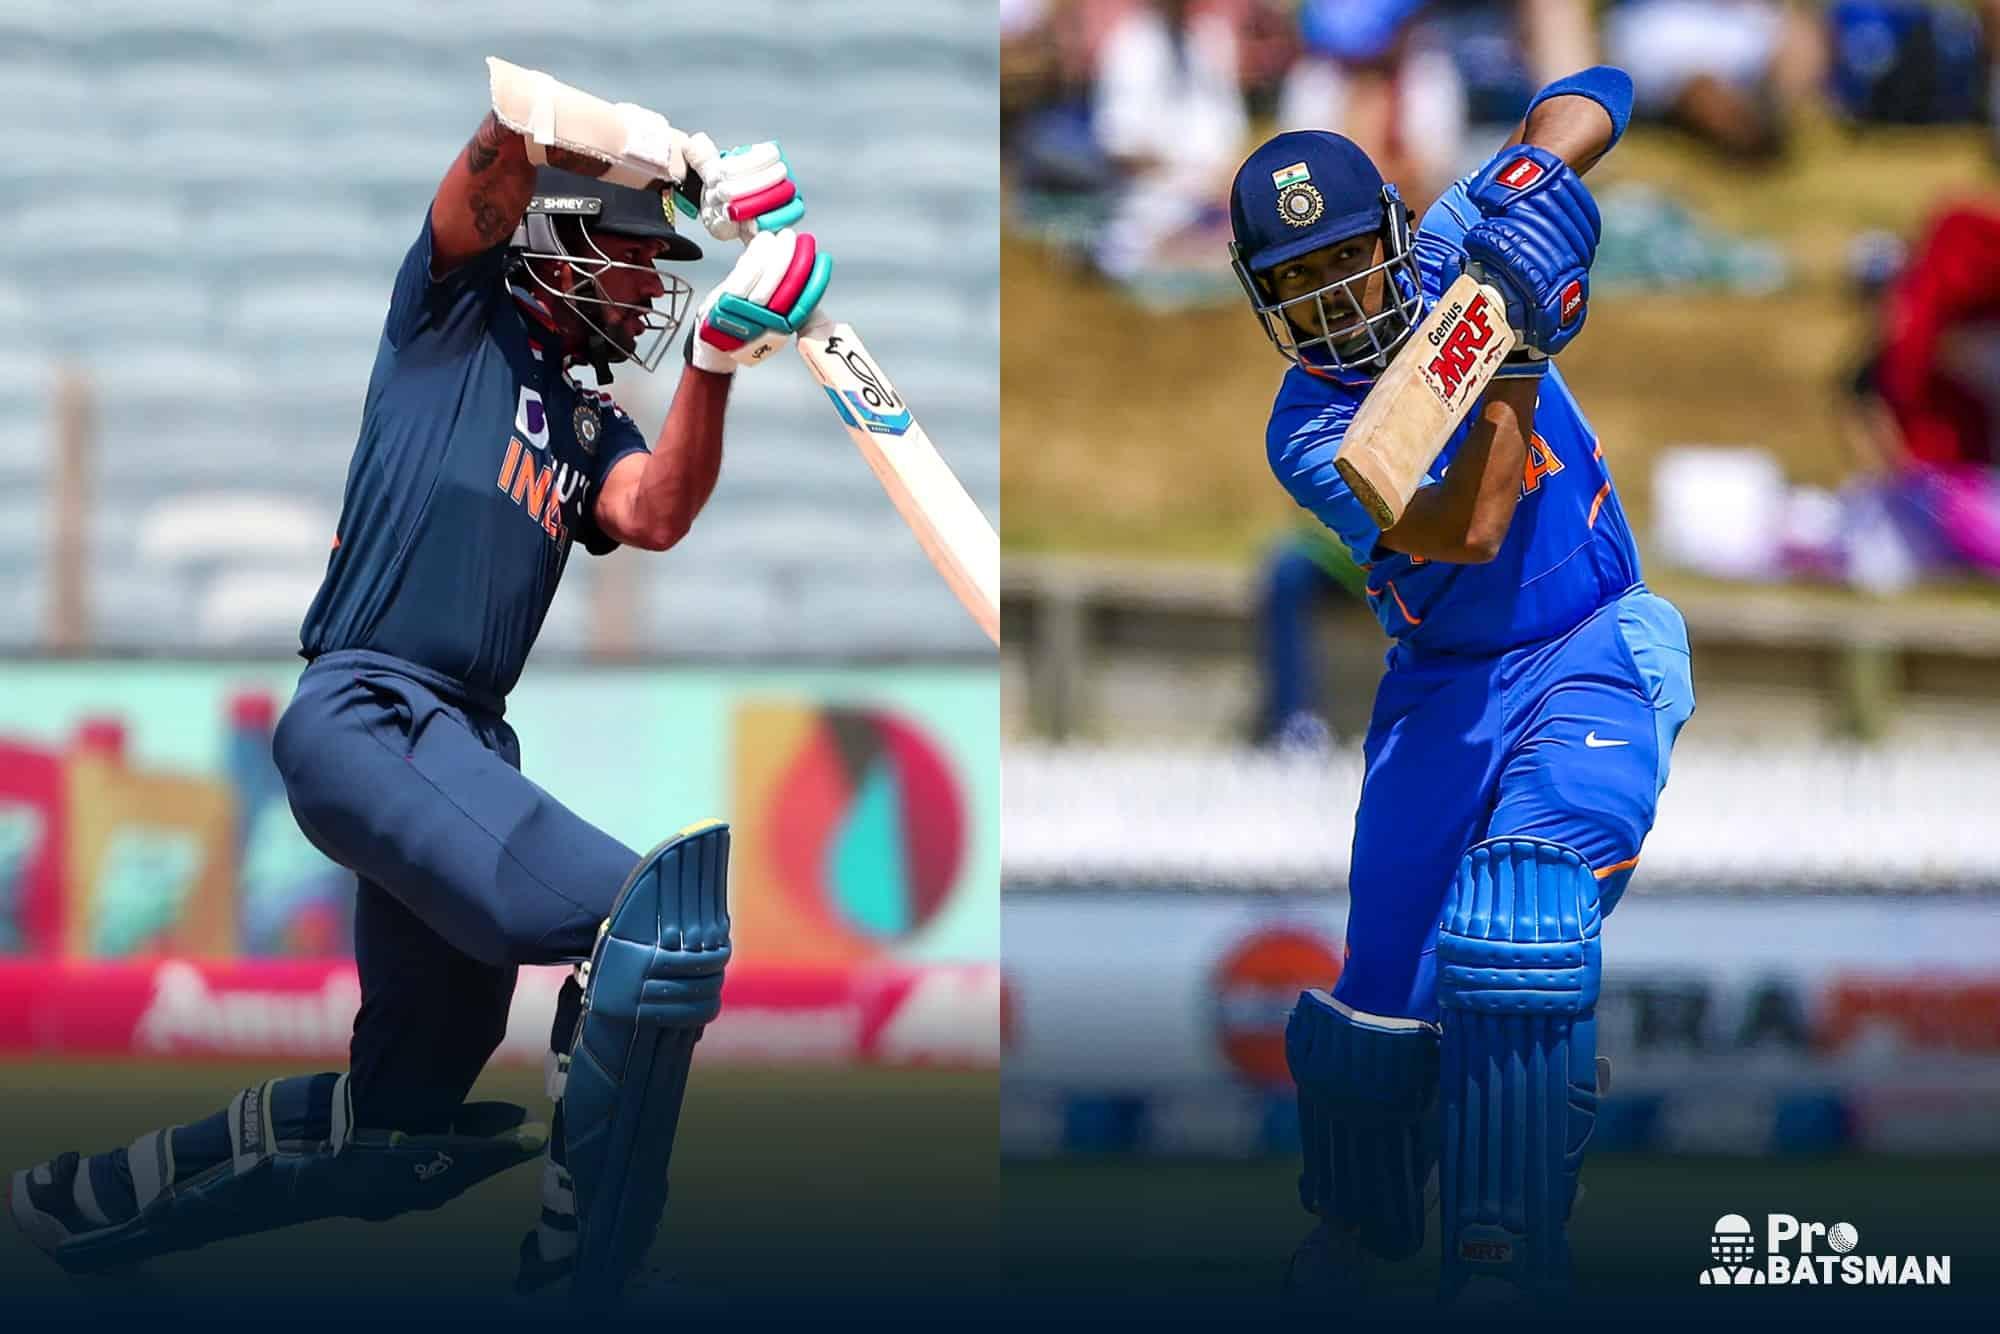 IND vs SL: Shikhar Dhawan & Prithvi Shaw